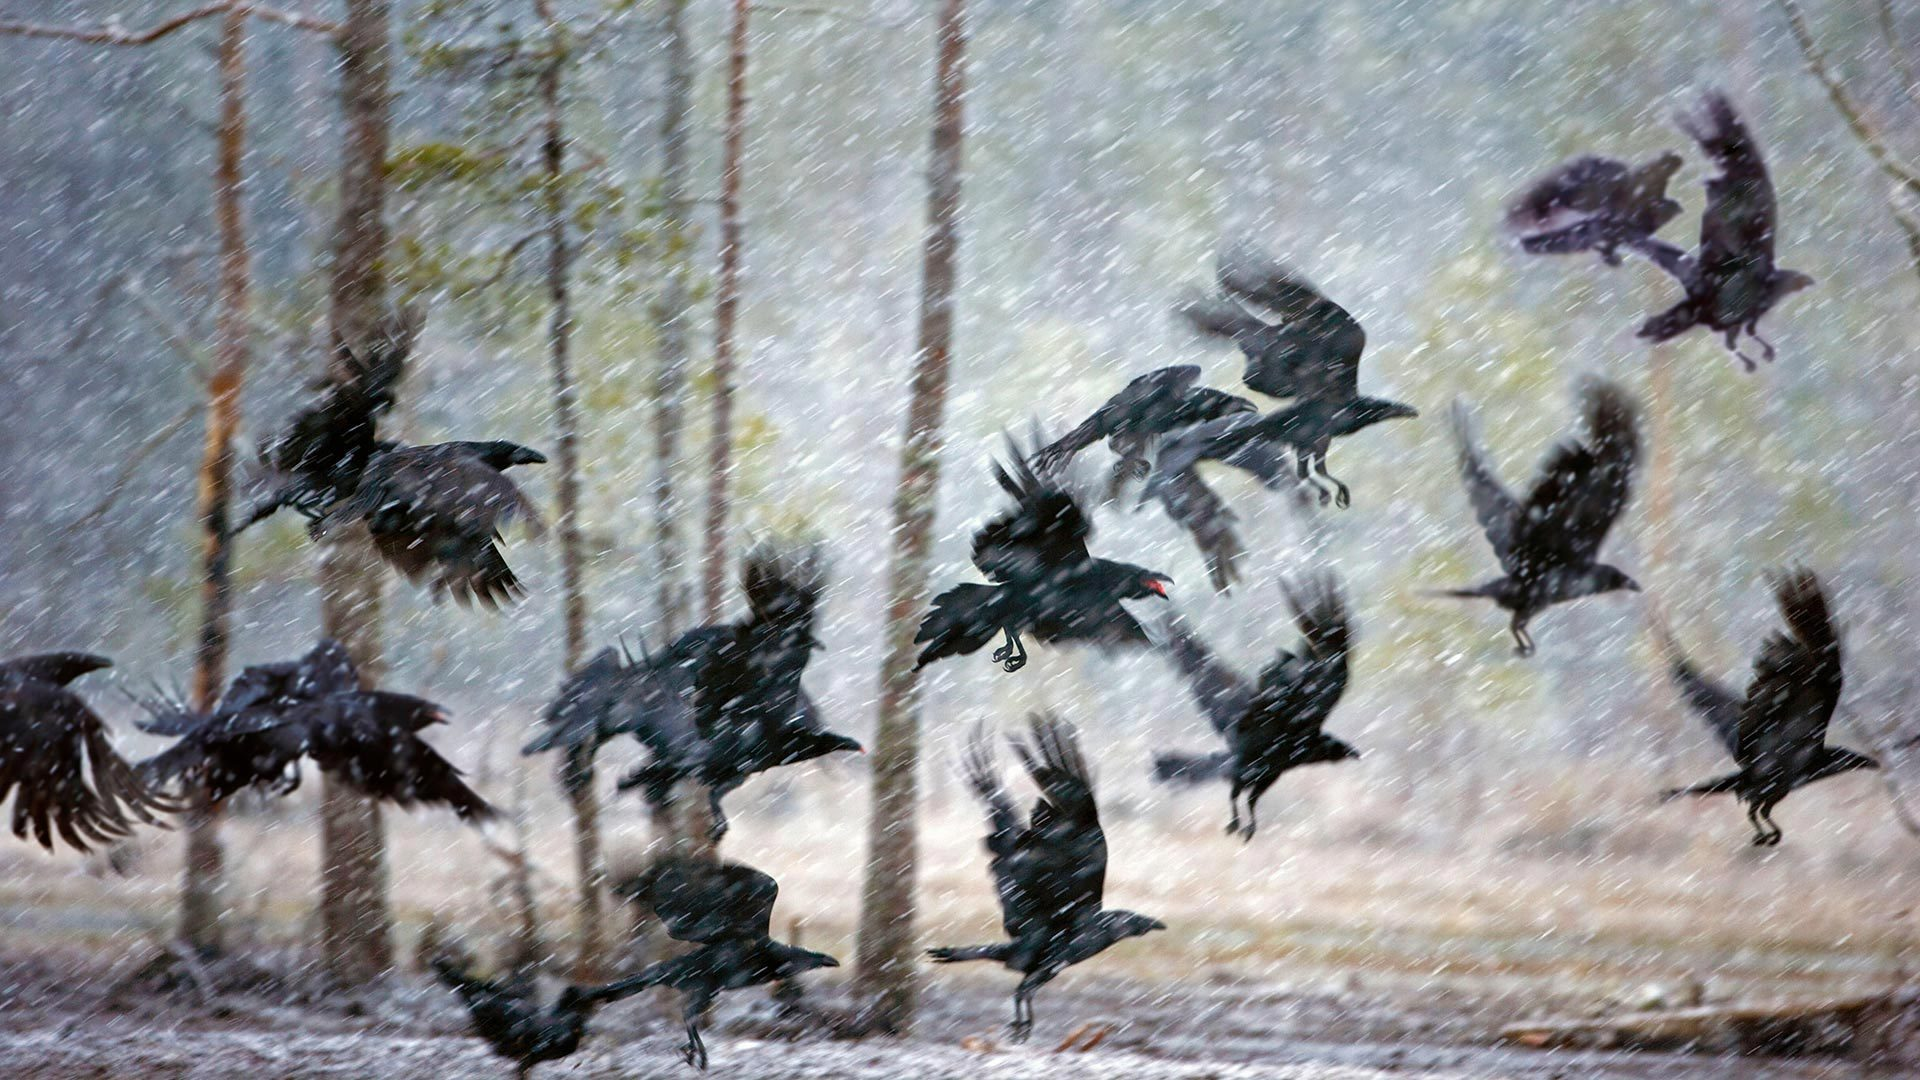 库赫莫附近暴风雪中的乌鸦库赫莫